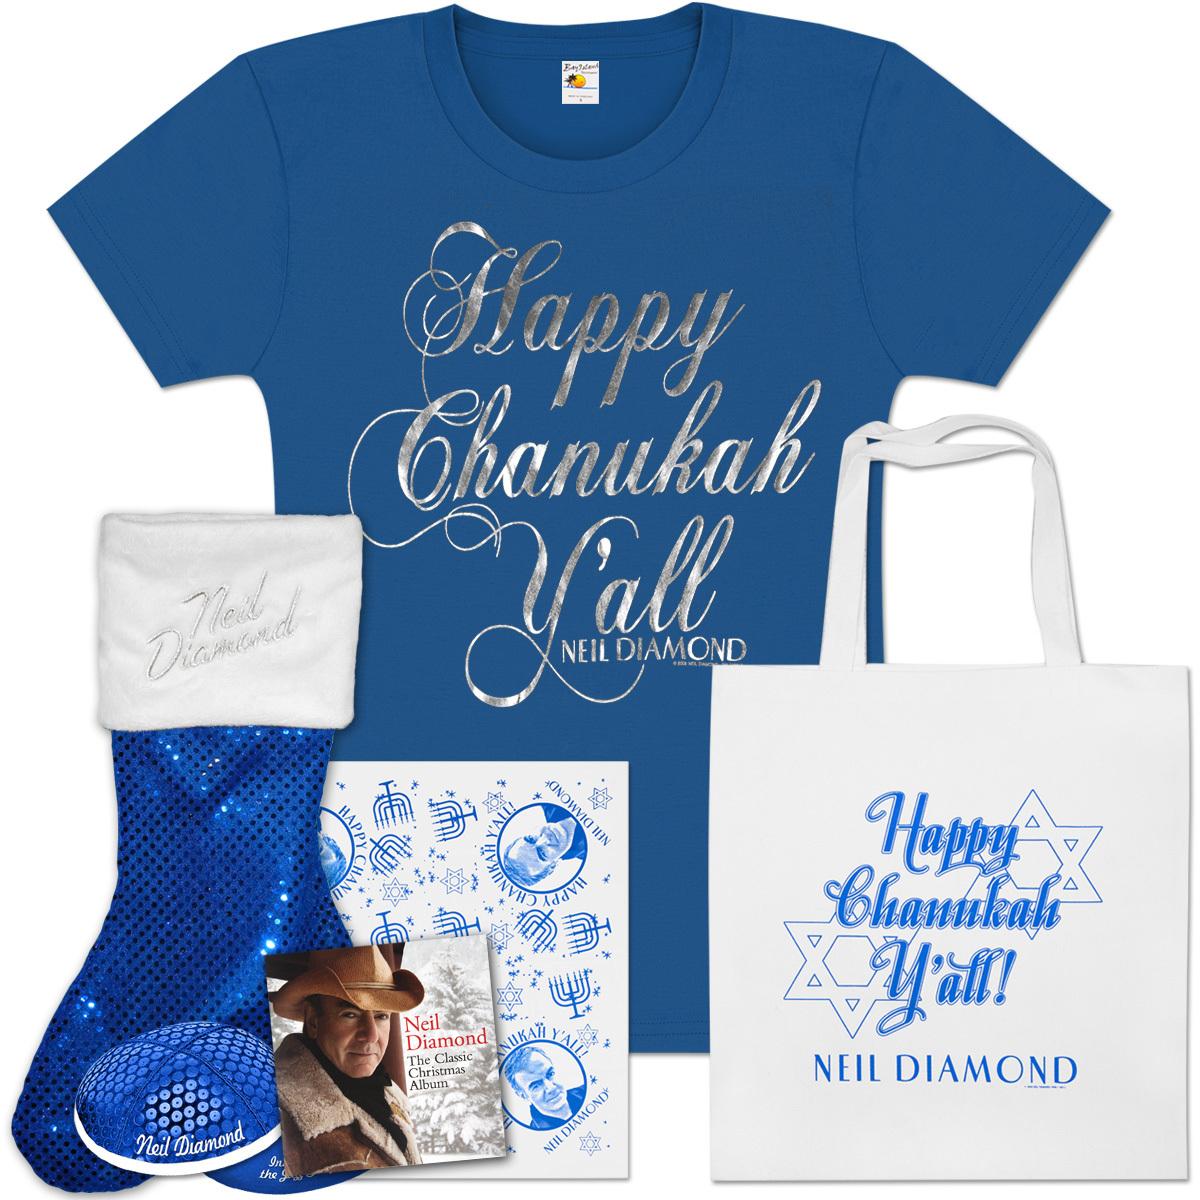 Neil Diamond Chanukah Package